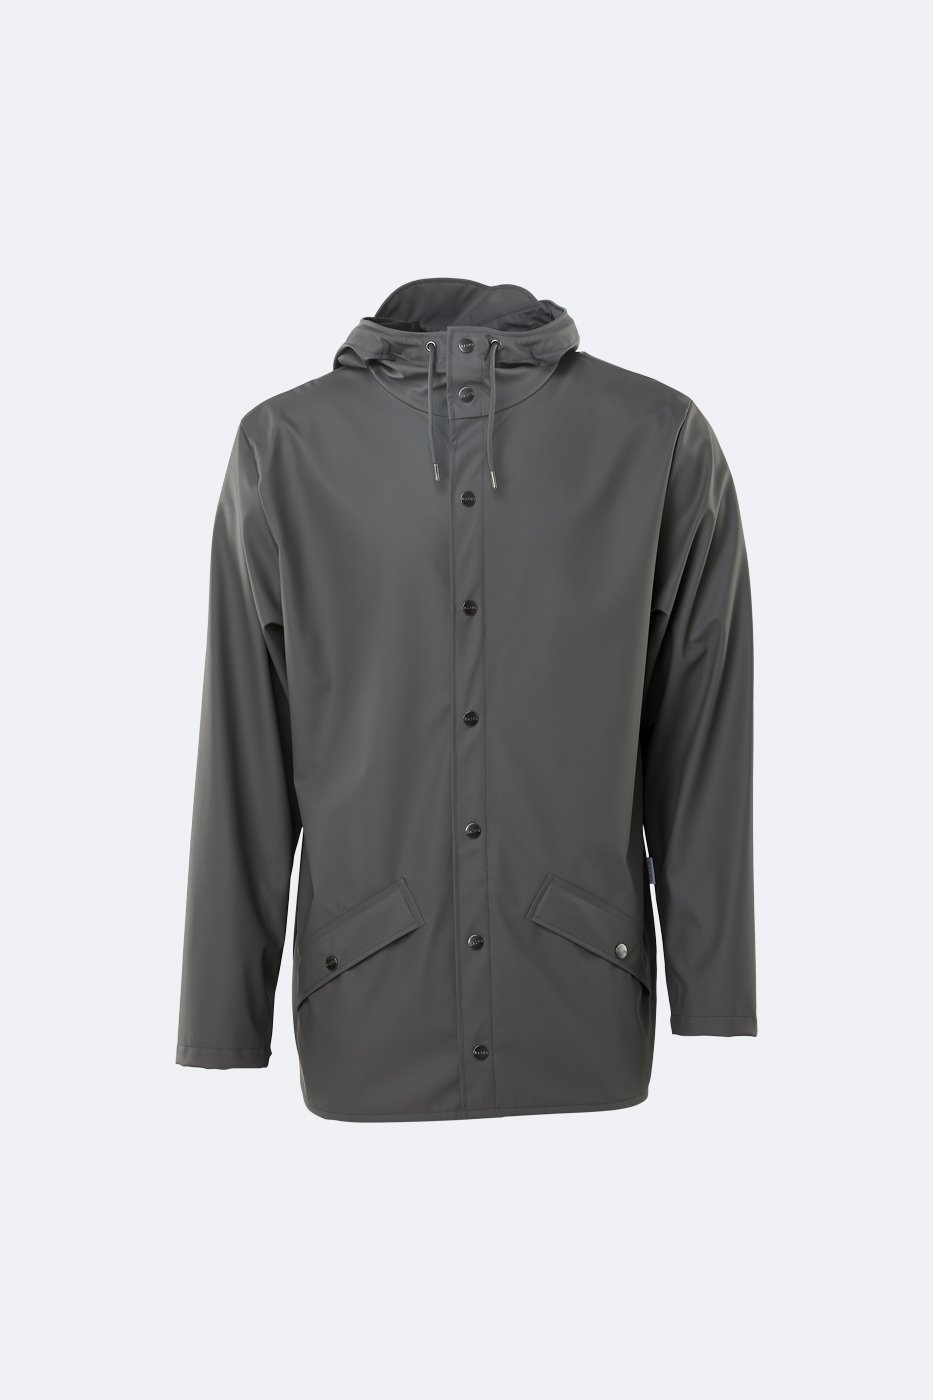 Rains Jacket charcoal unisex XS/S